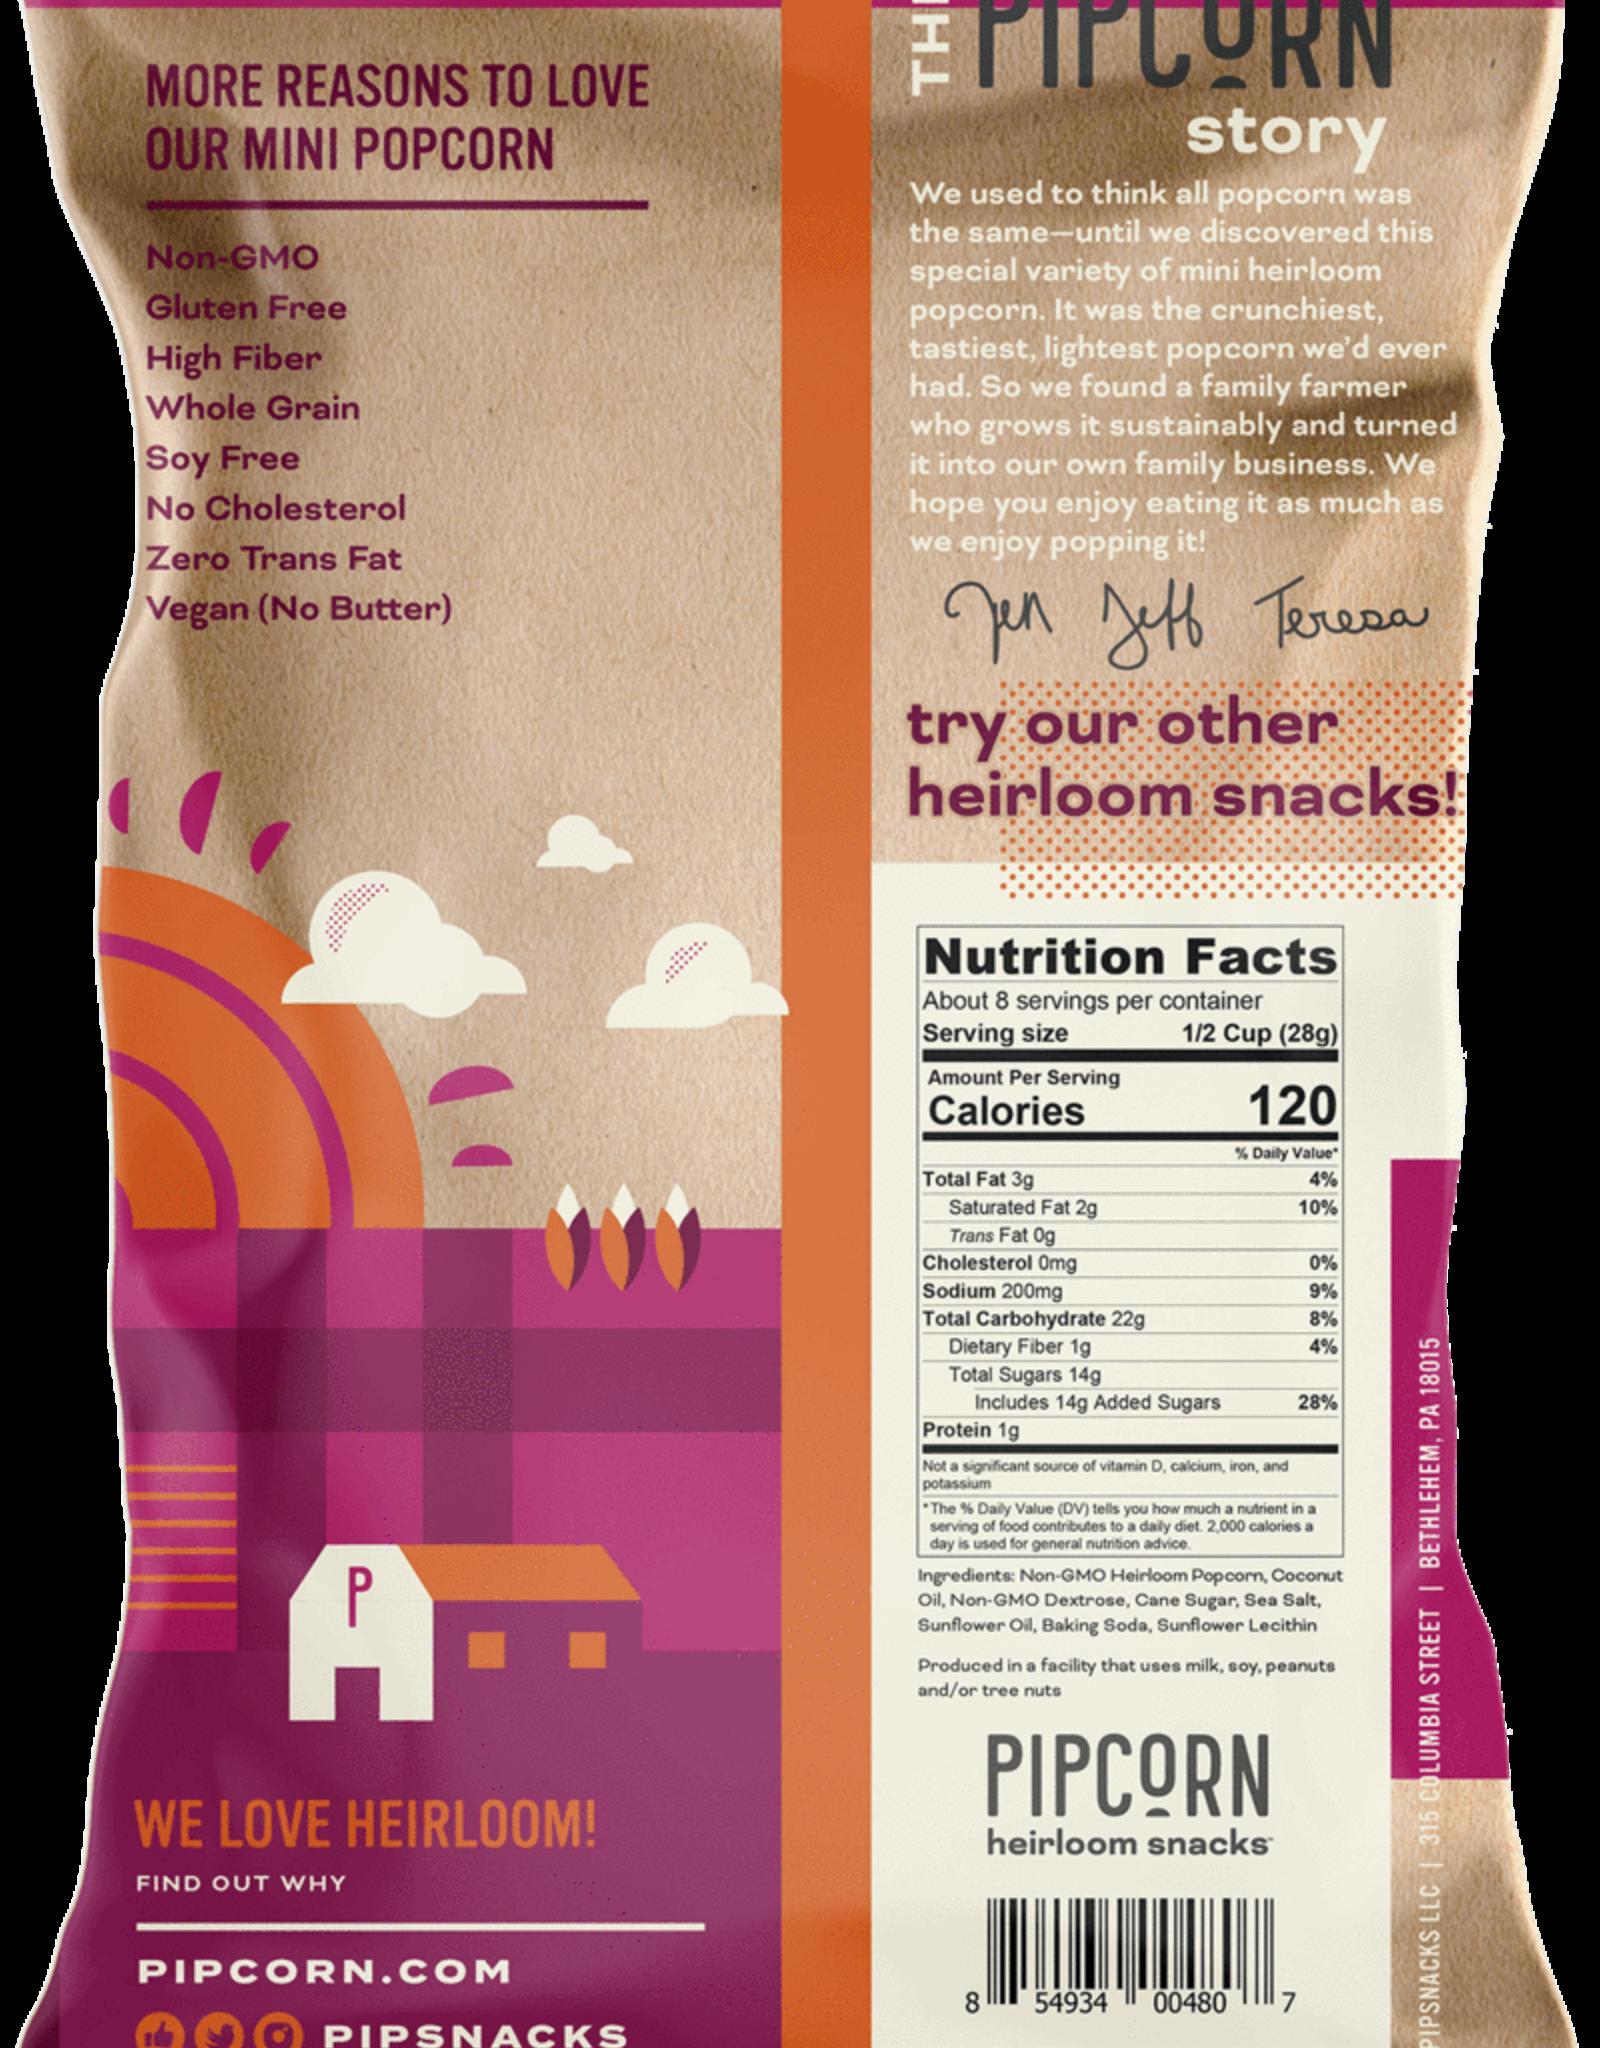 (PC) Vegan PipCorn Caramel Popcorn*(PC) 全素爆米花